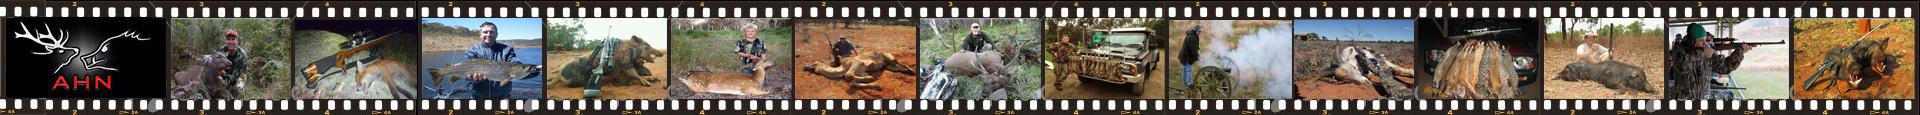 Australian Hunting Net